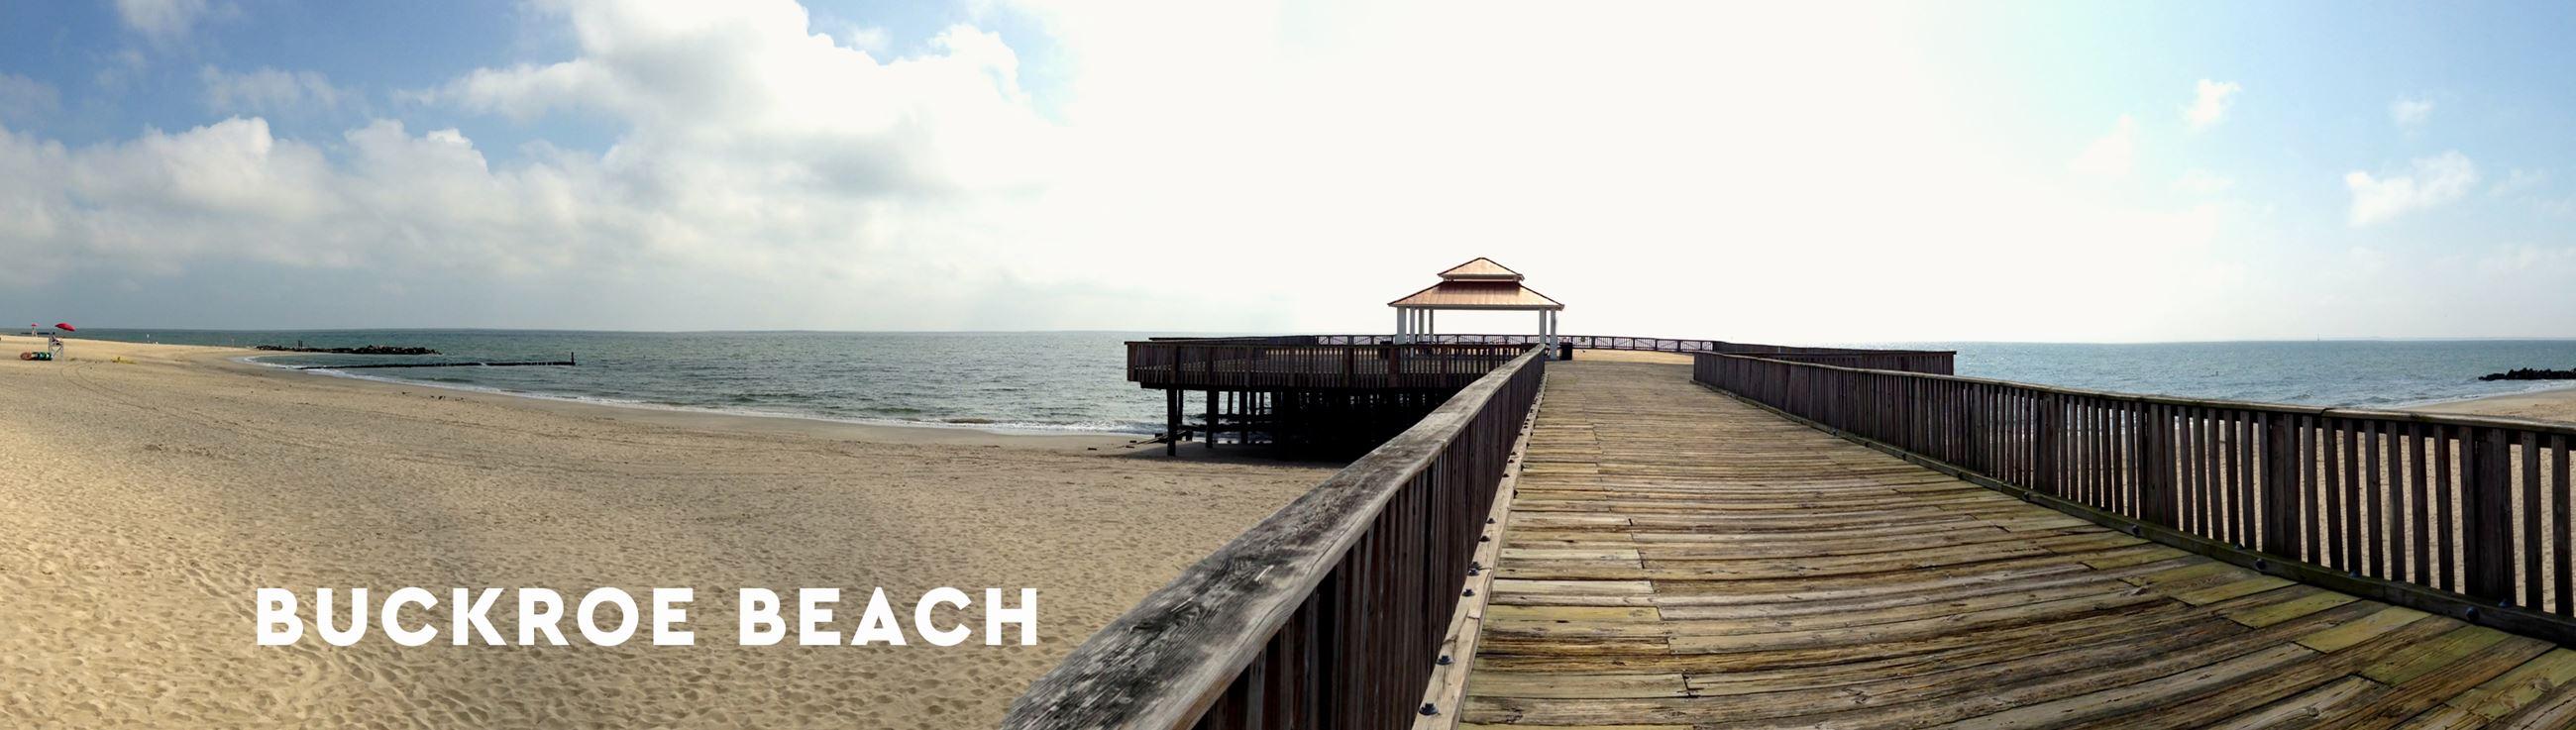 Parks recreation hampton va official website for Buckroe beach fishing pier